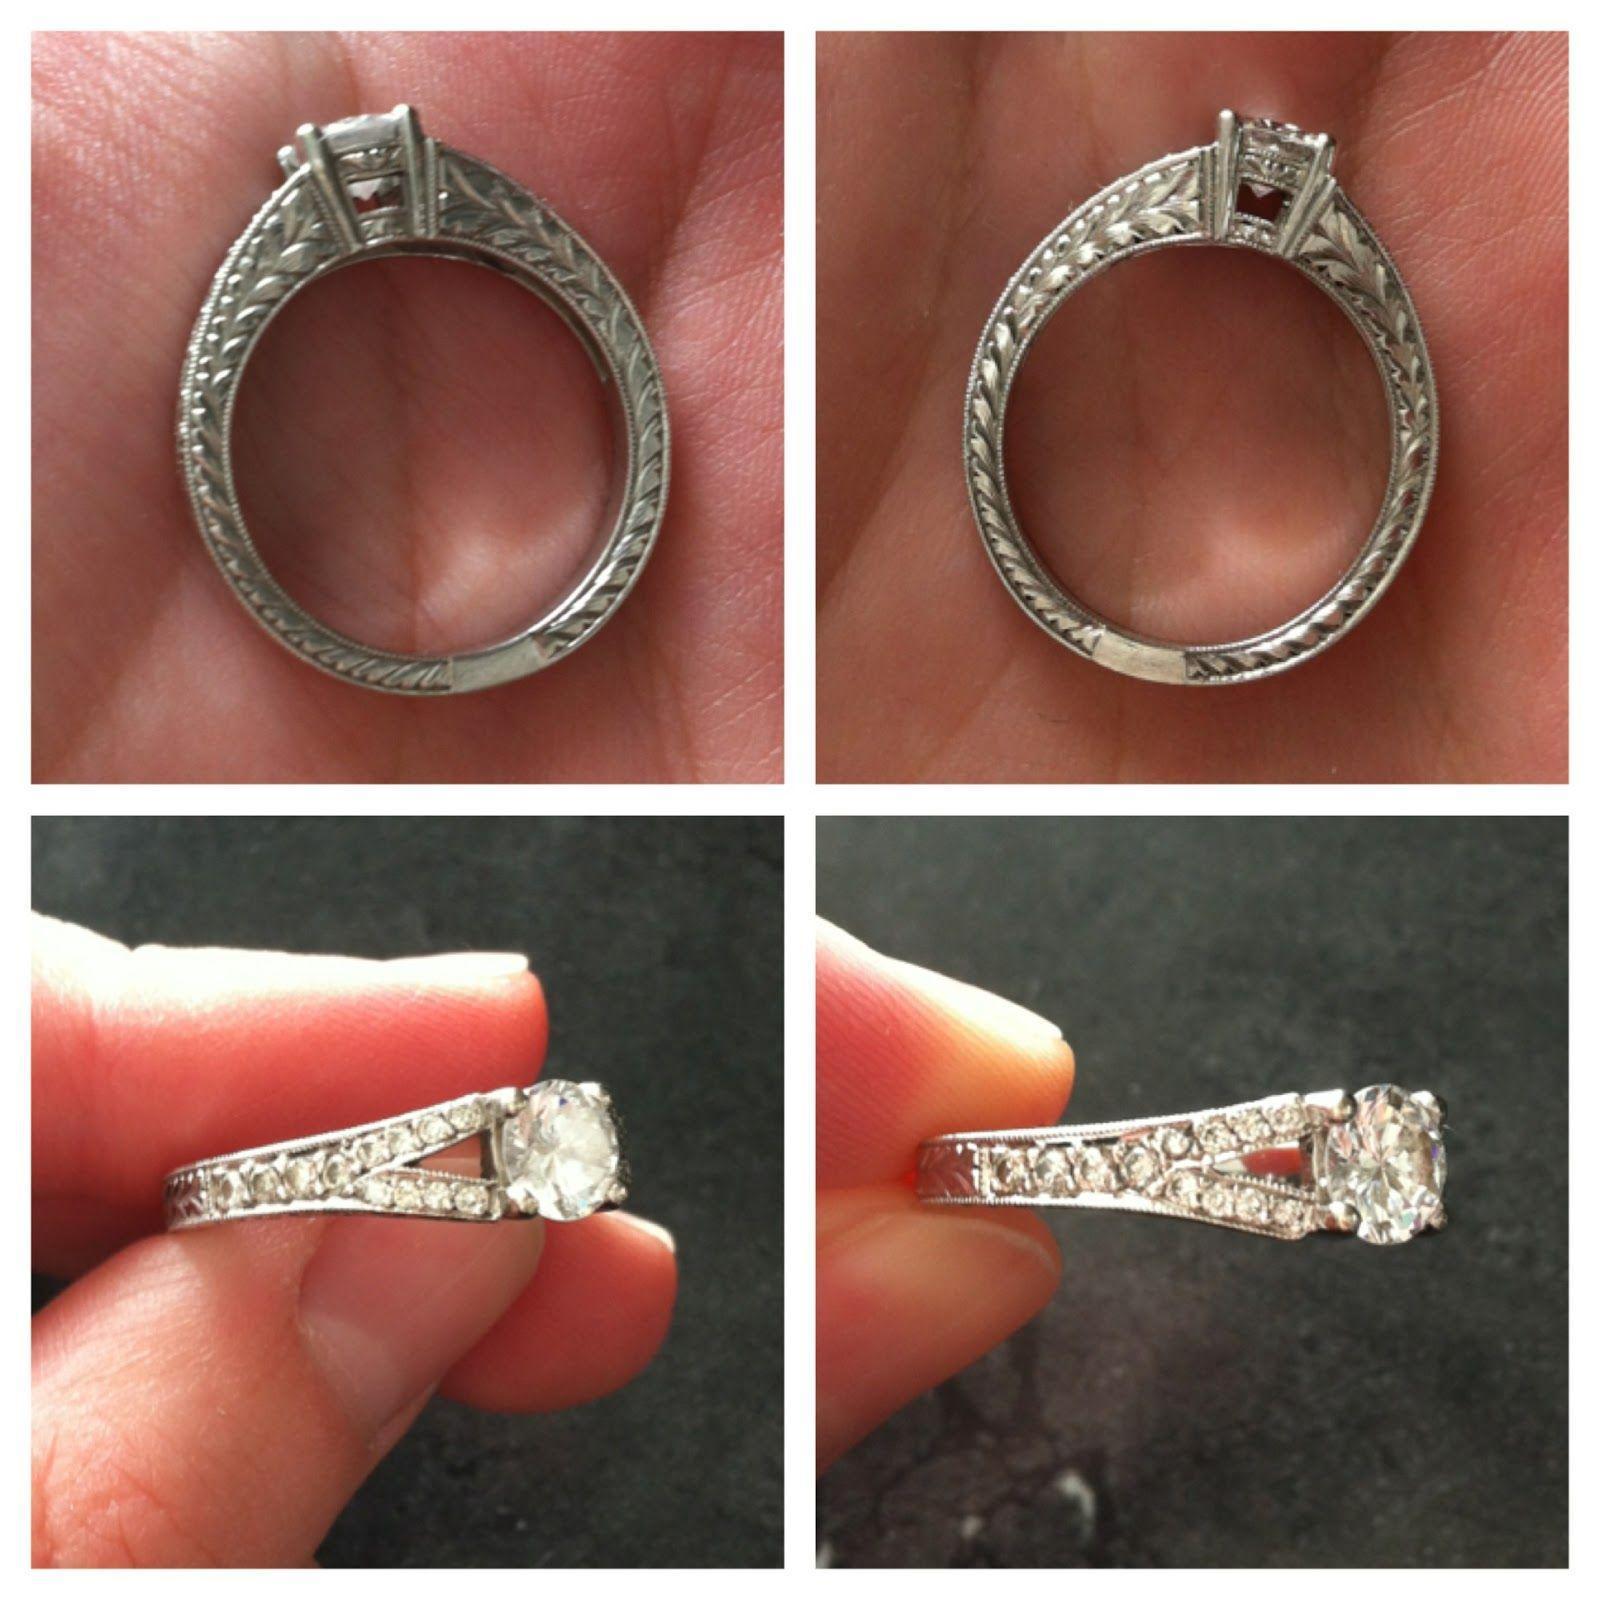 Homemade jewelry cleaner diy homemade jewelry silver